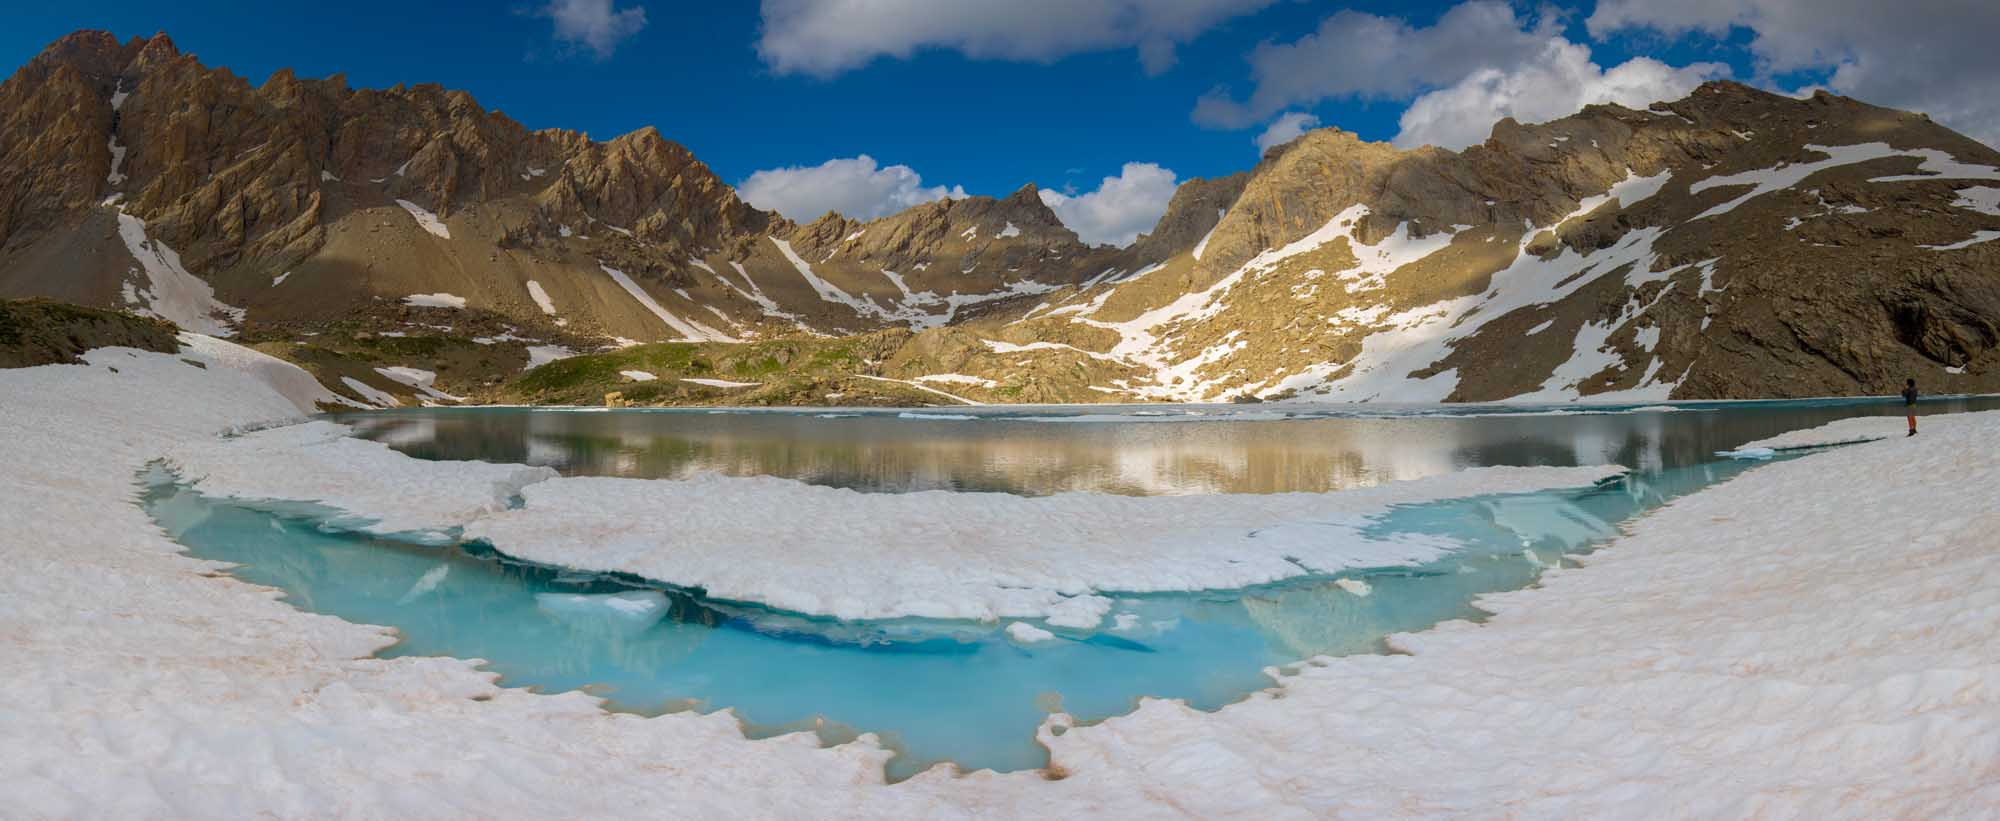 Untitled_Panorama4 (2).jpg